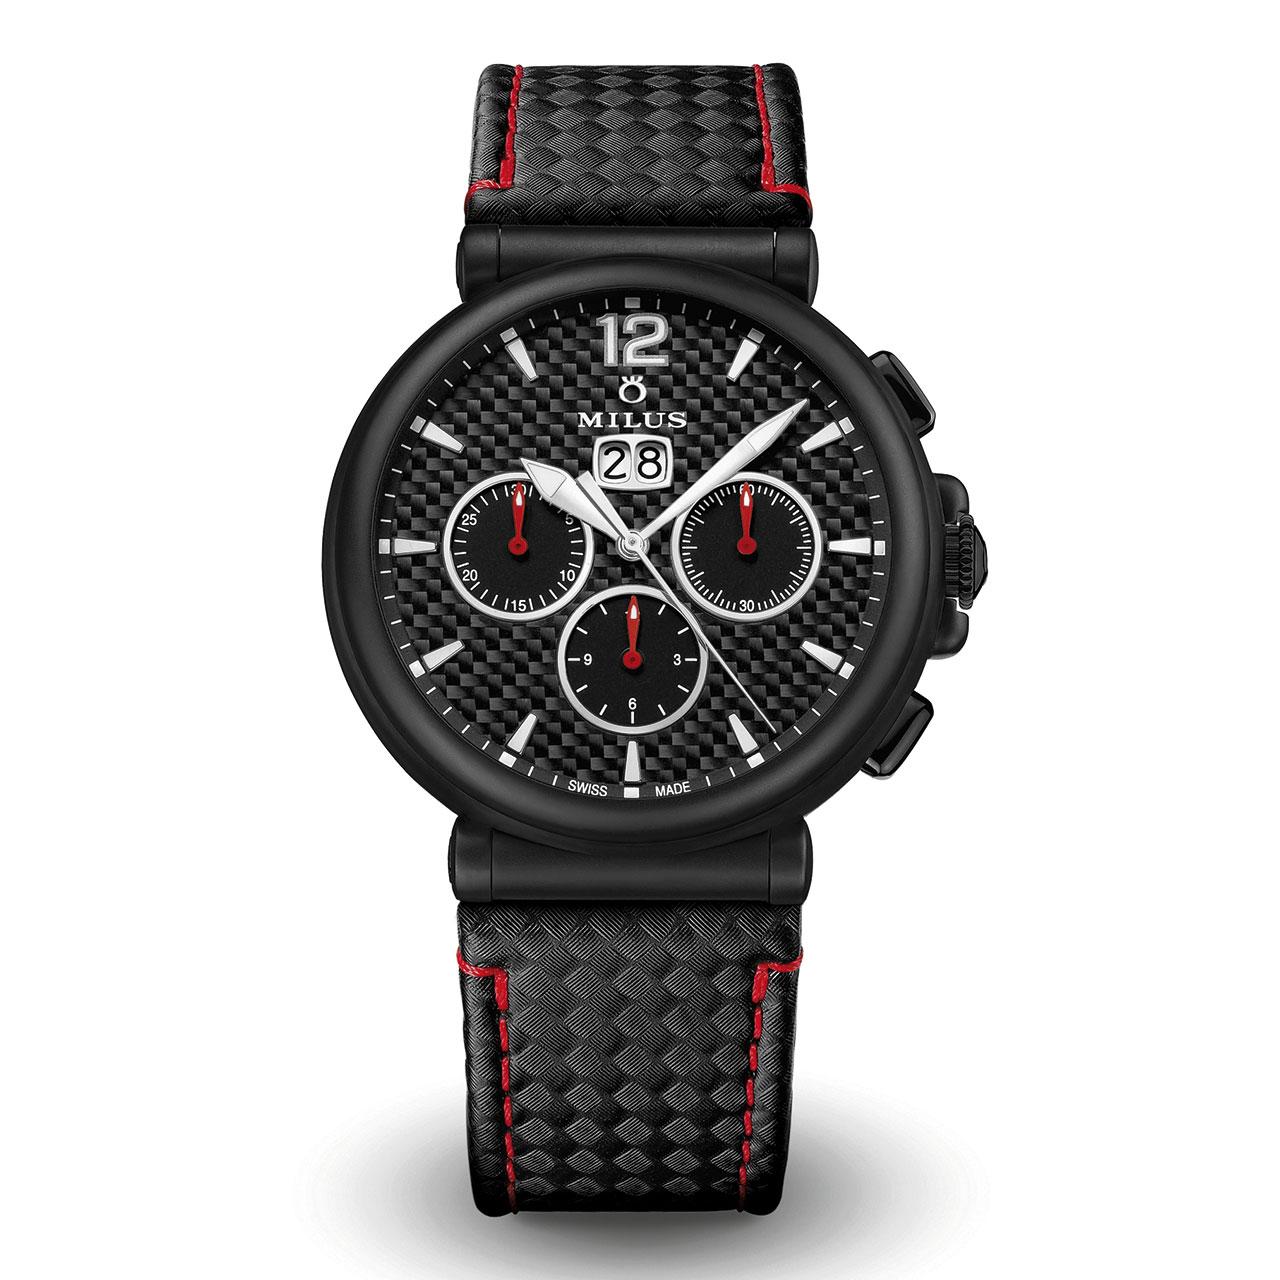 Milus Zetios Chronograph Automatic Watch